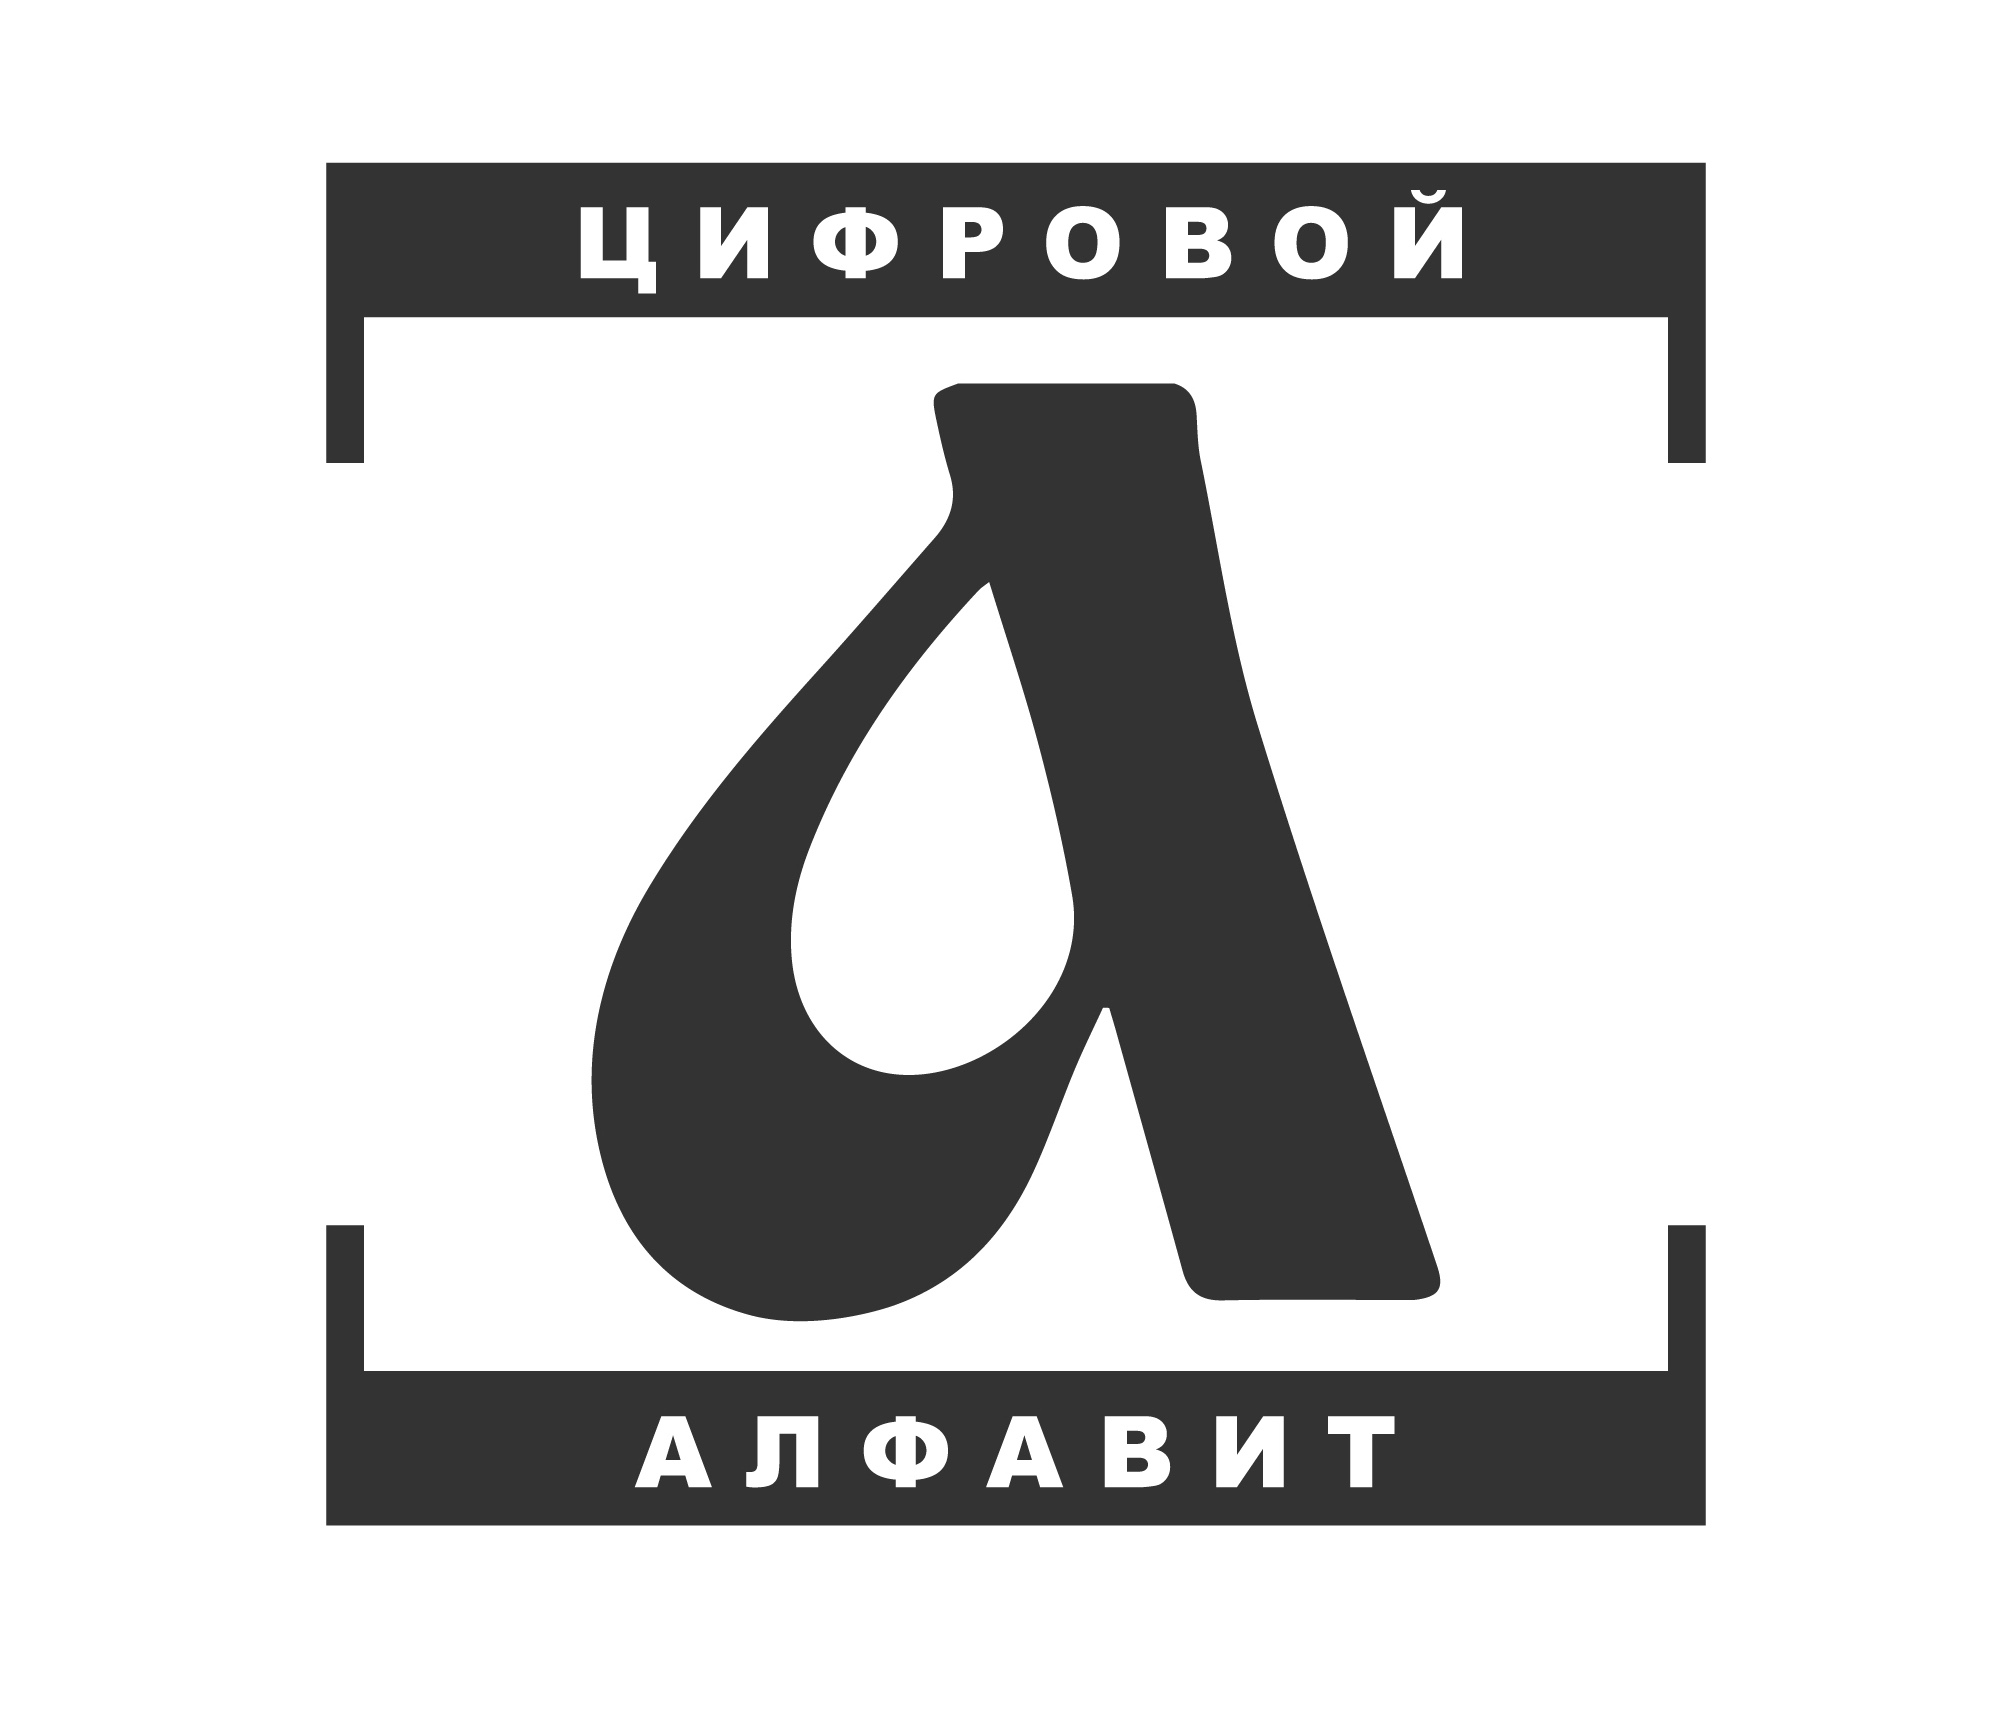 Цифровой Алфавит